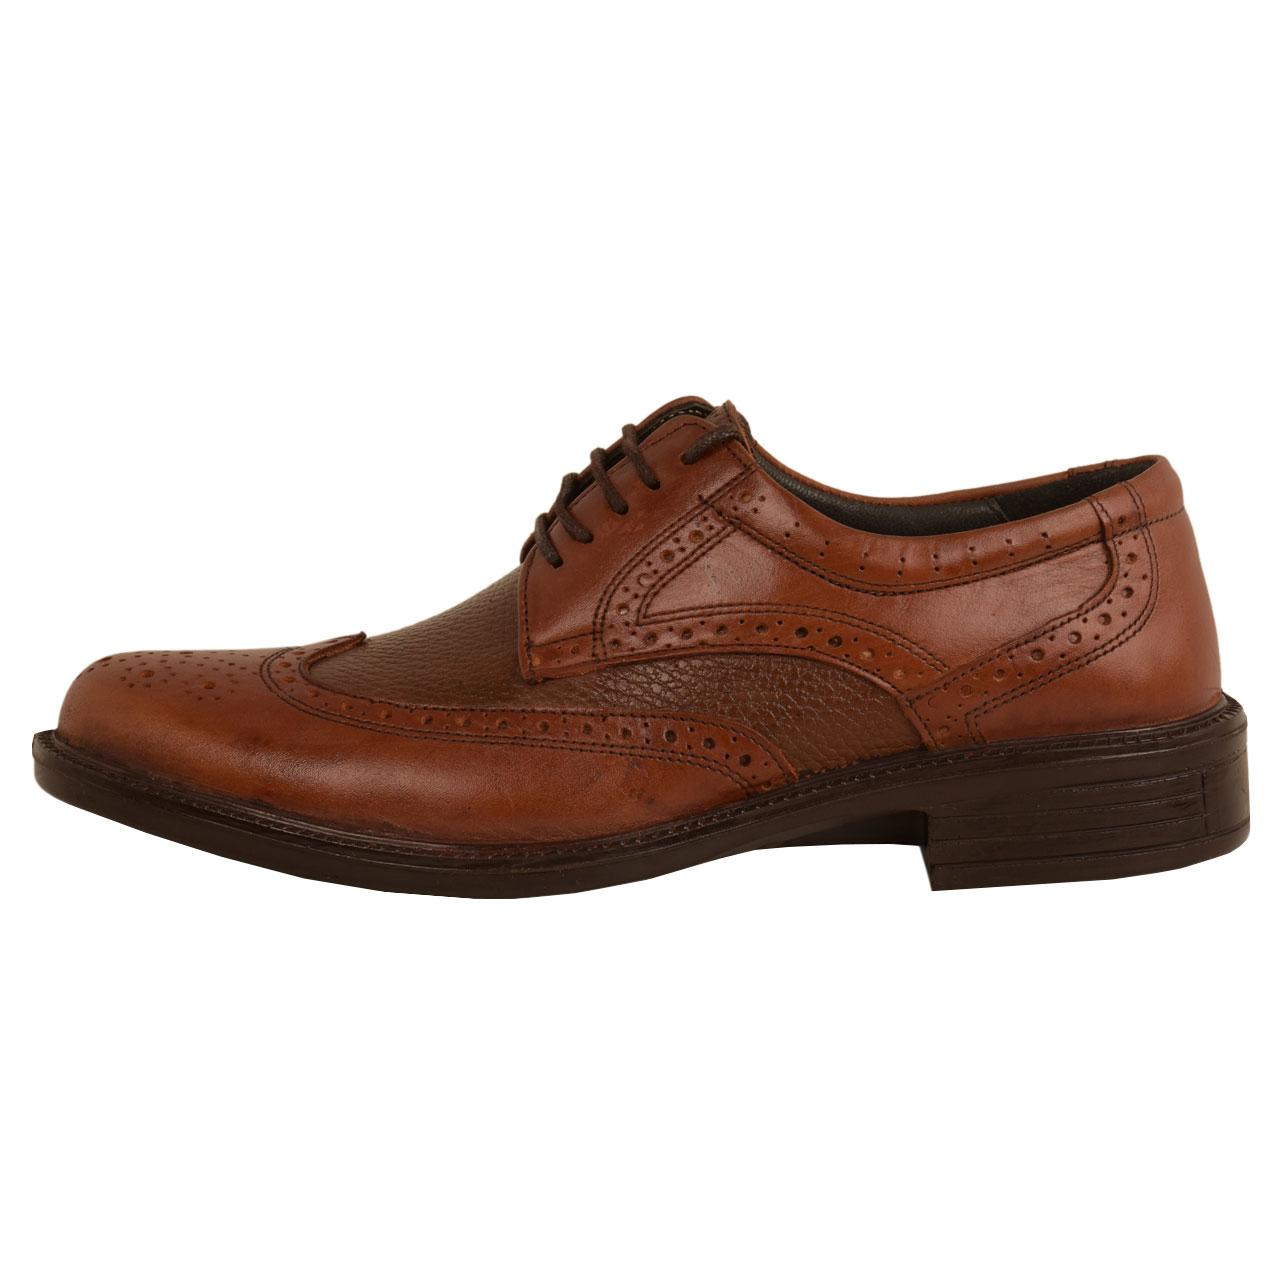 کفش  مردانه پارینه چرم مدل SHO177-1